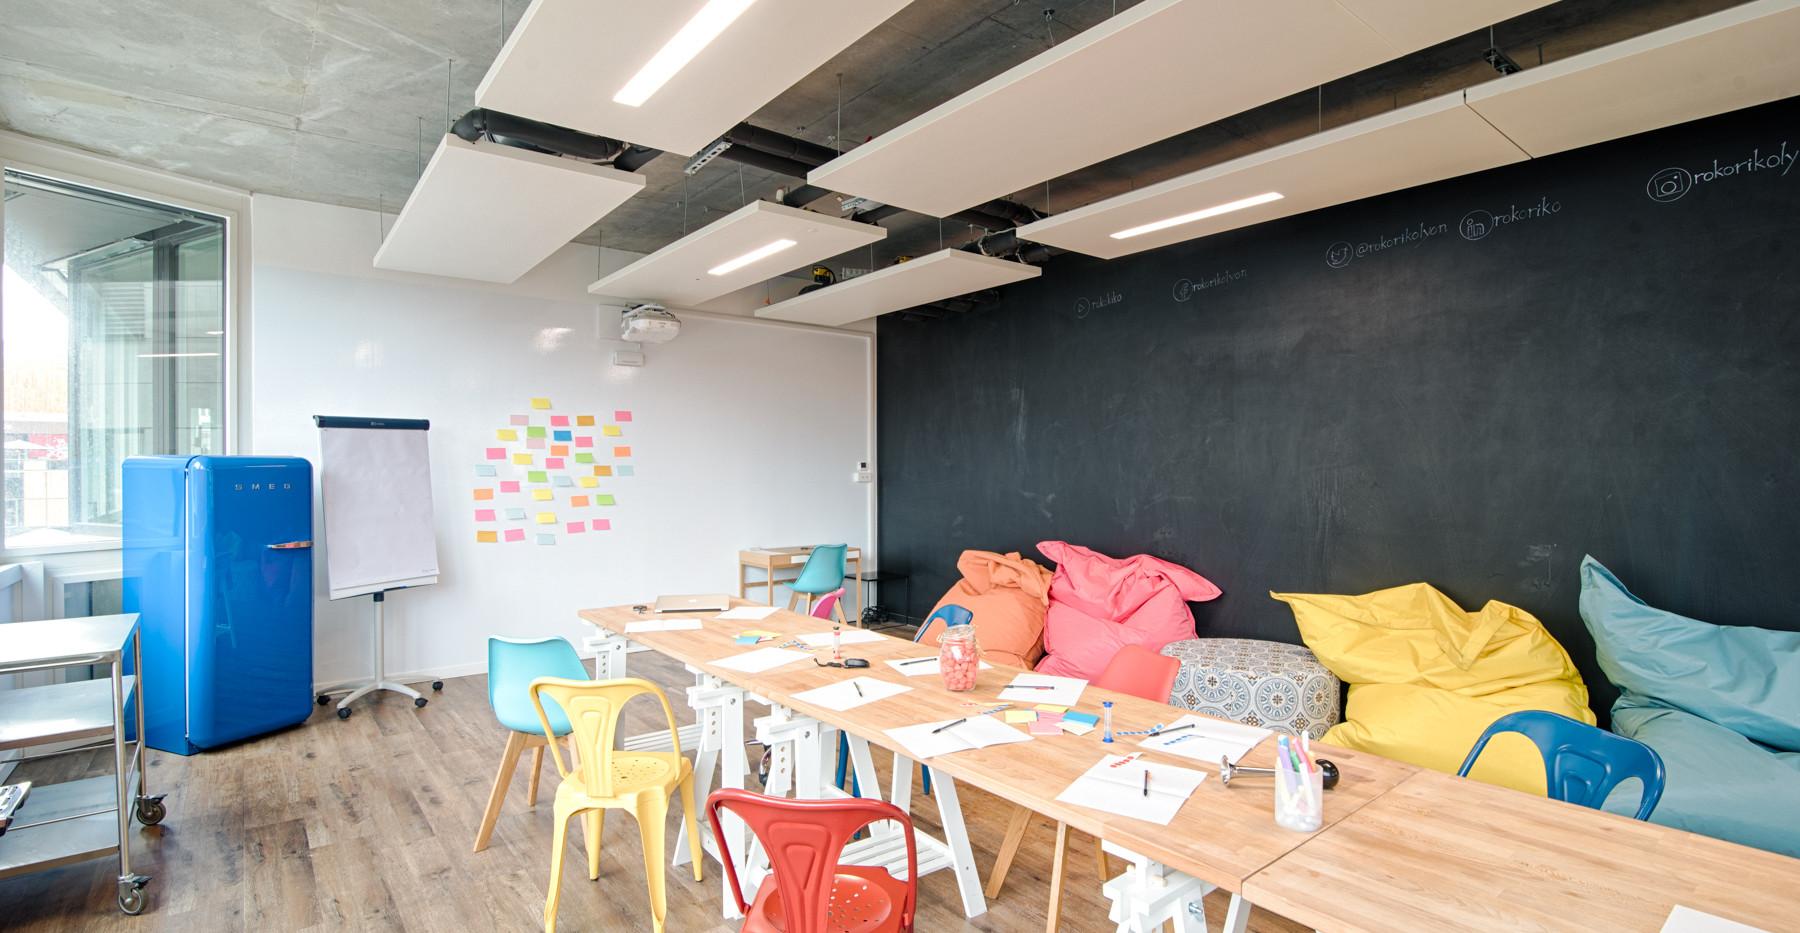 Rokoriko Basic - salle de réunion